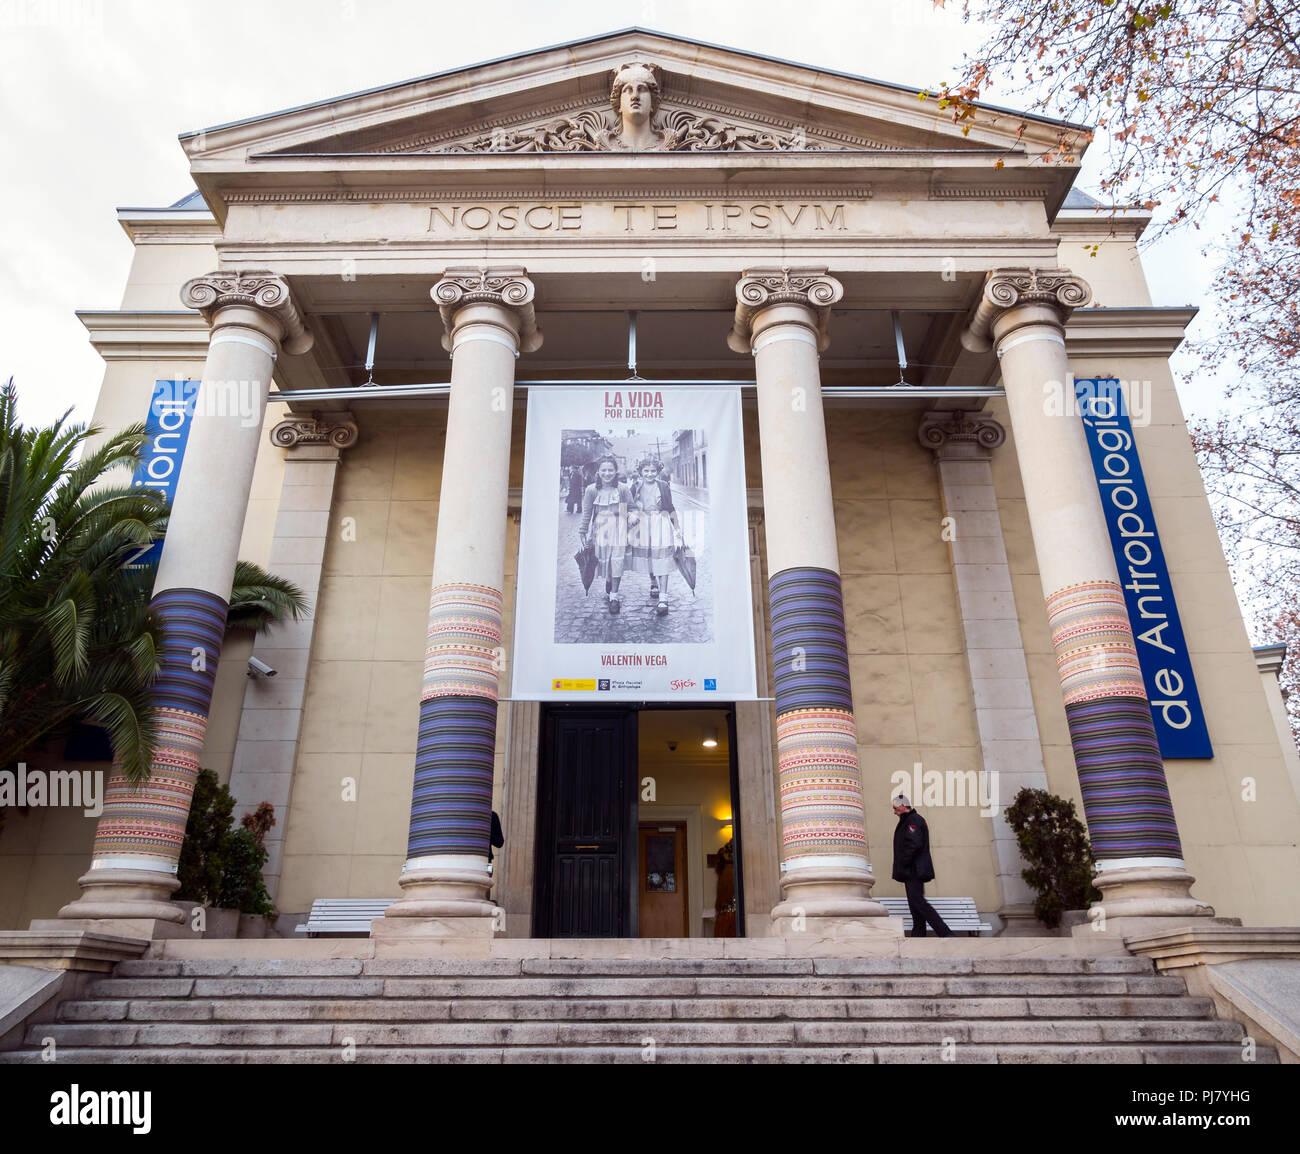 Museo Nacional de Antropología. Madrid. España - Stock Image